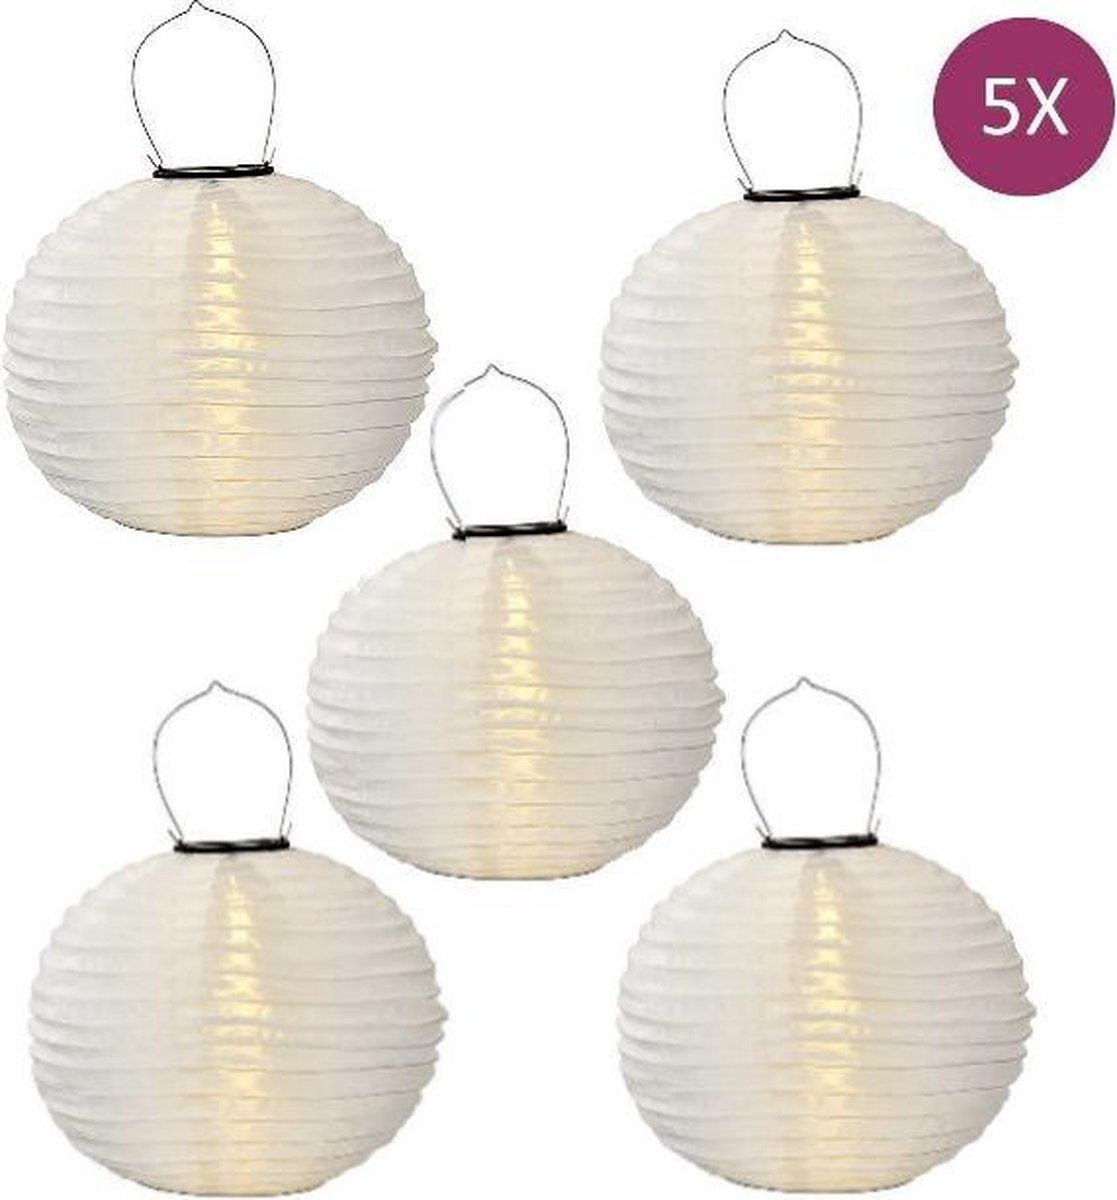 Solar lampionnen wit 35 cm - 5 stuks